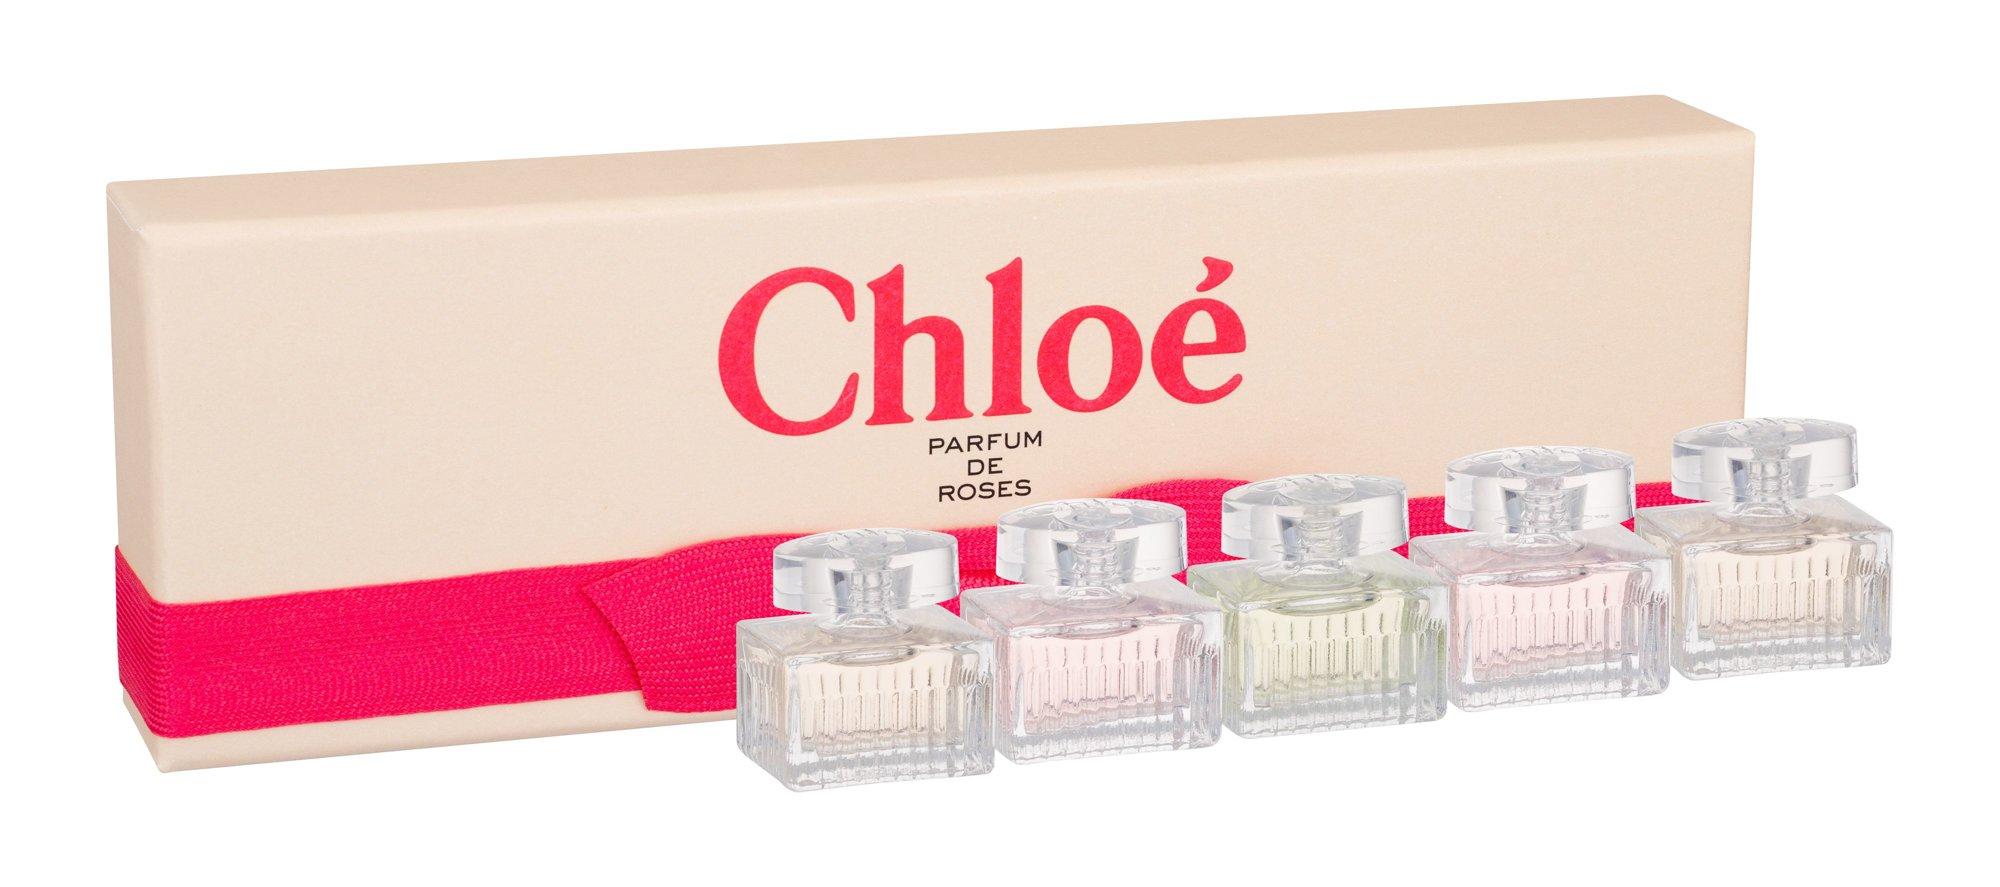 Chloe Mini Set 2 Eau de Parfum 5x5ml